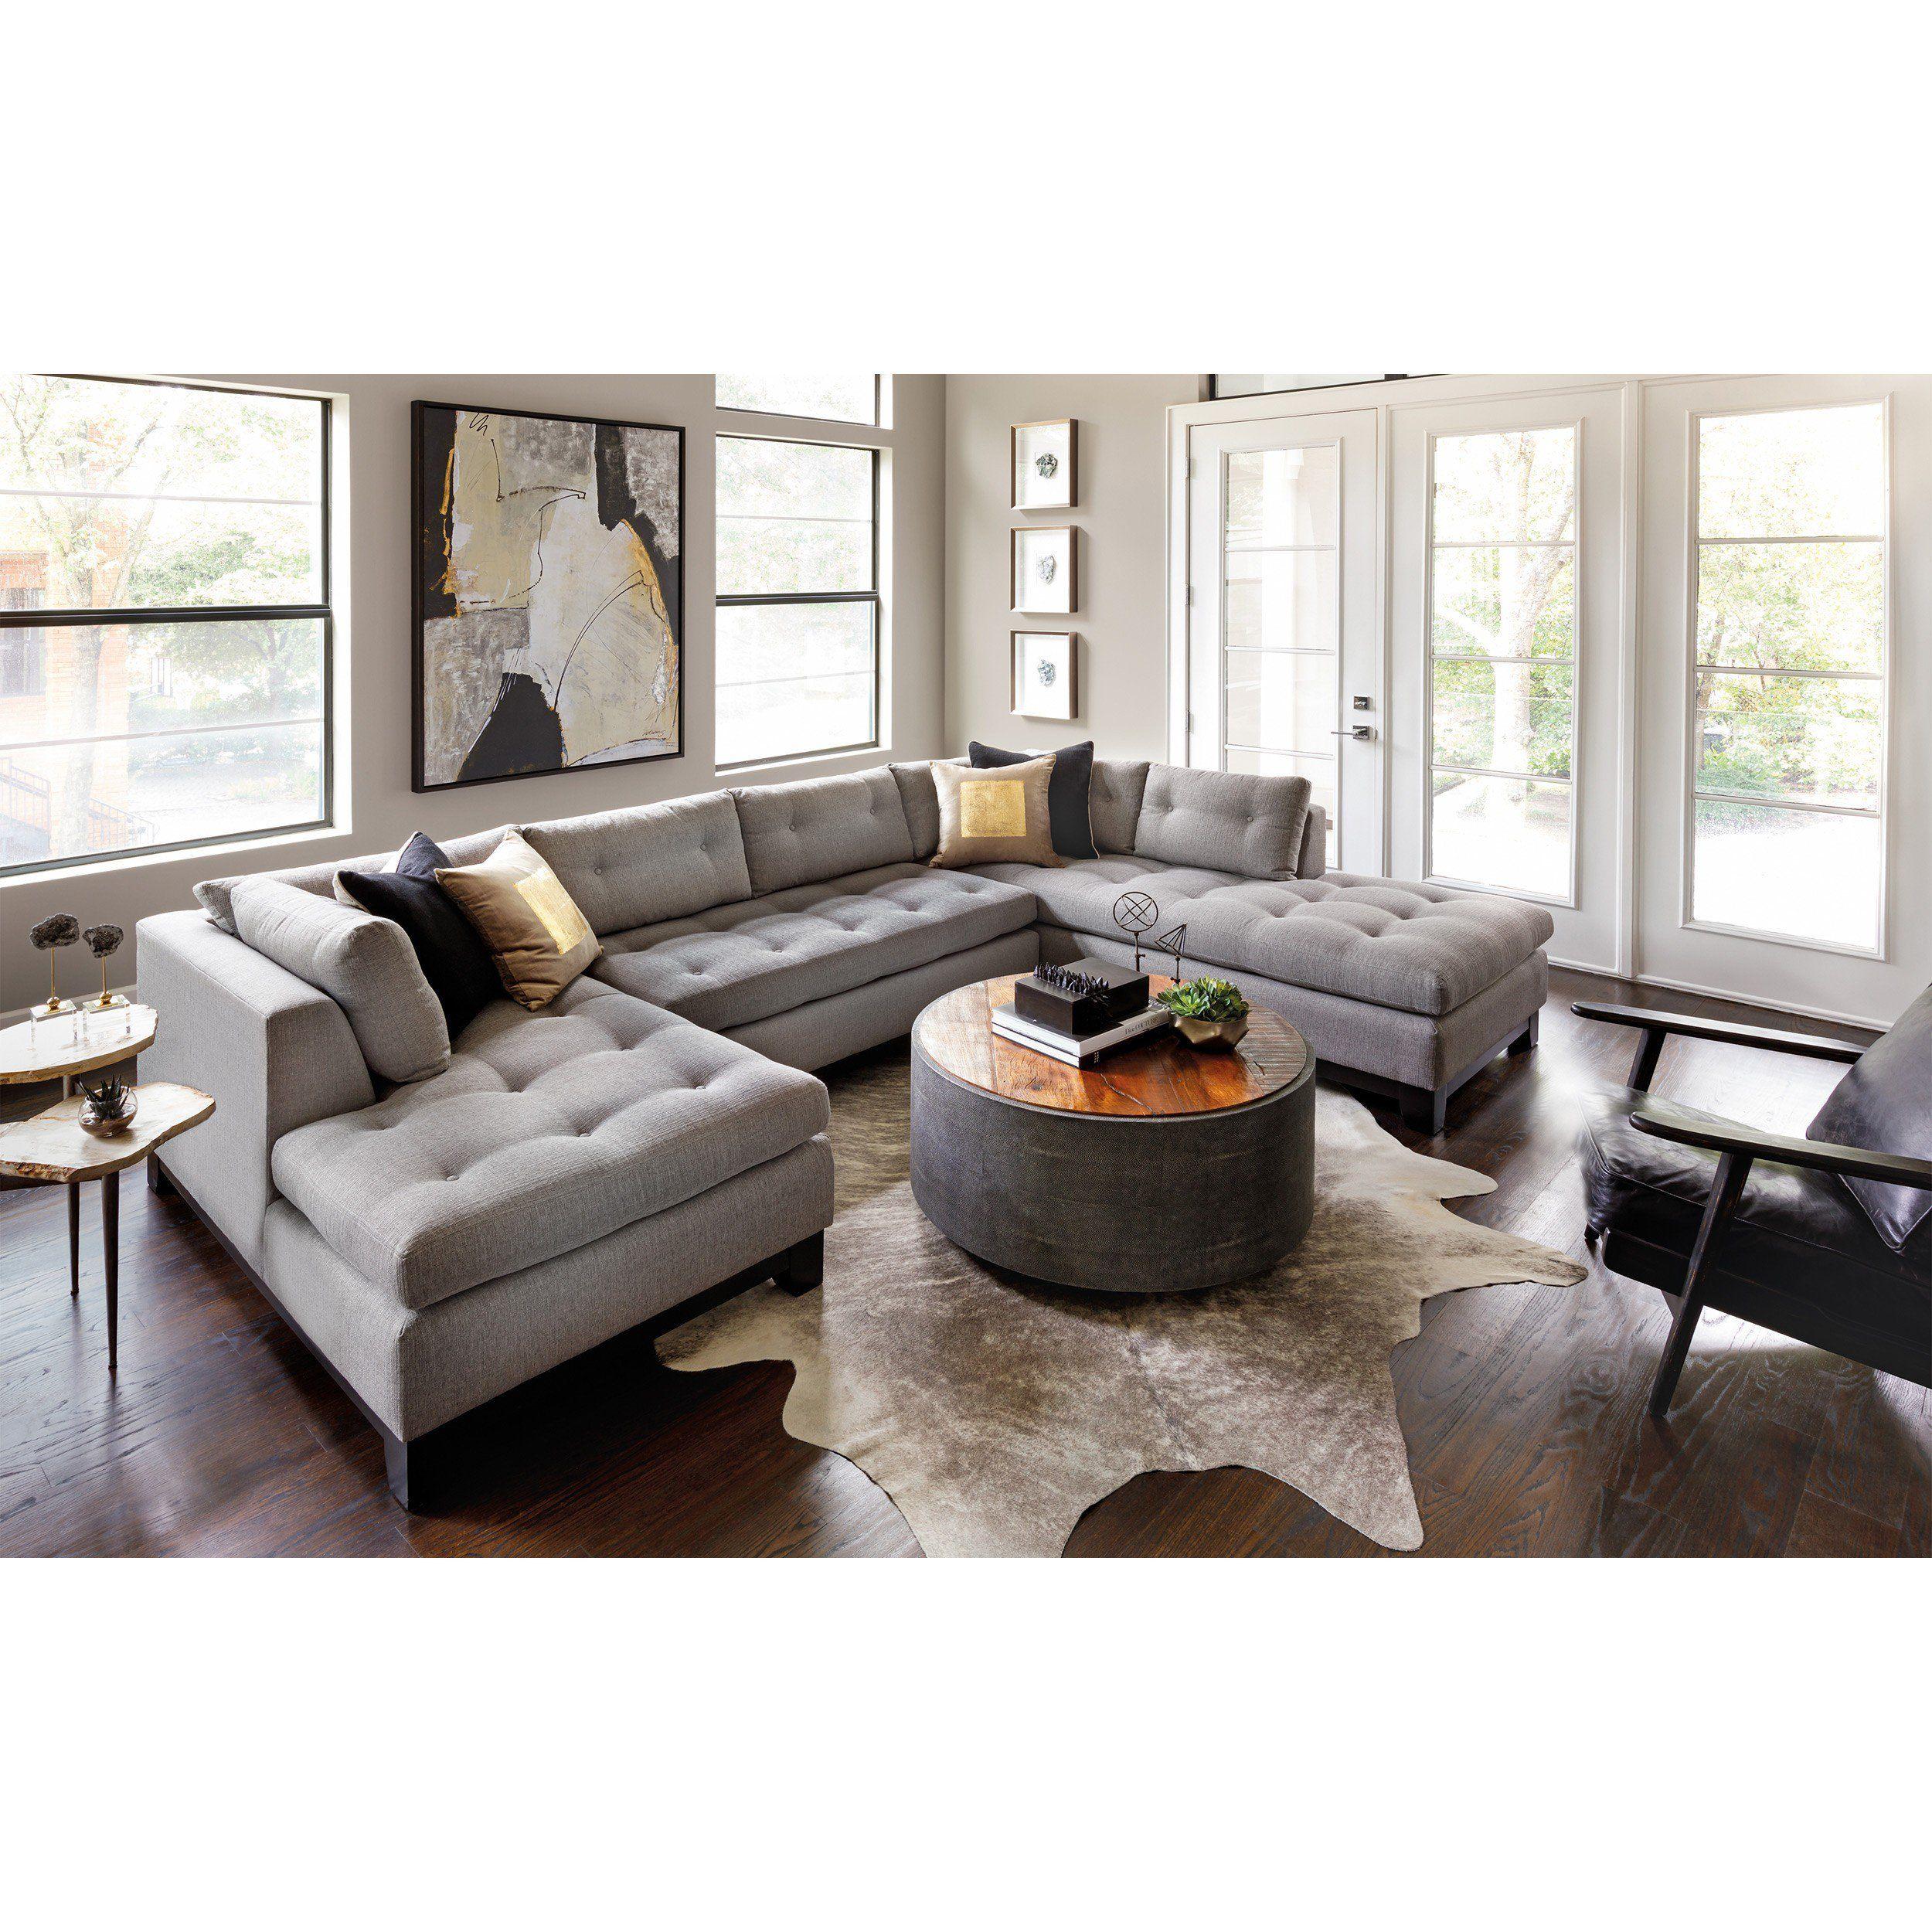 Chandler Sectional Durango Slate Home Living Room Living Room